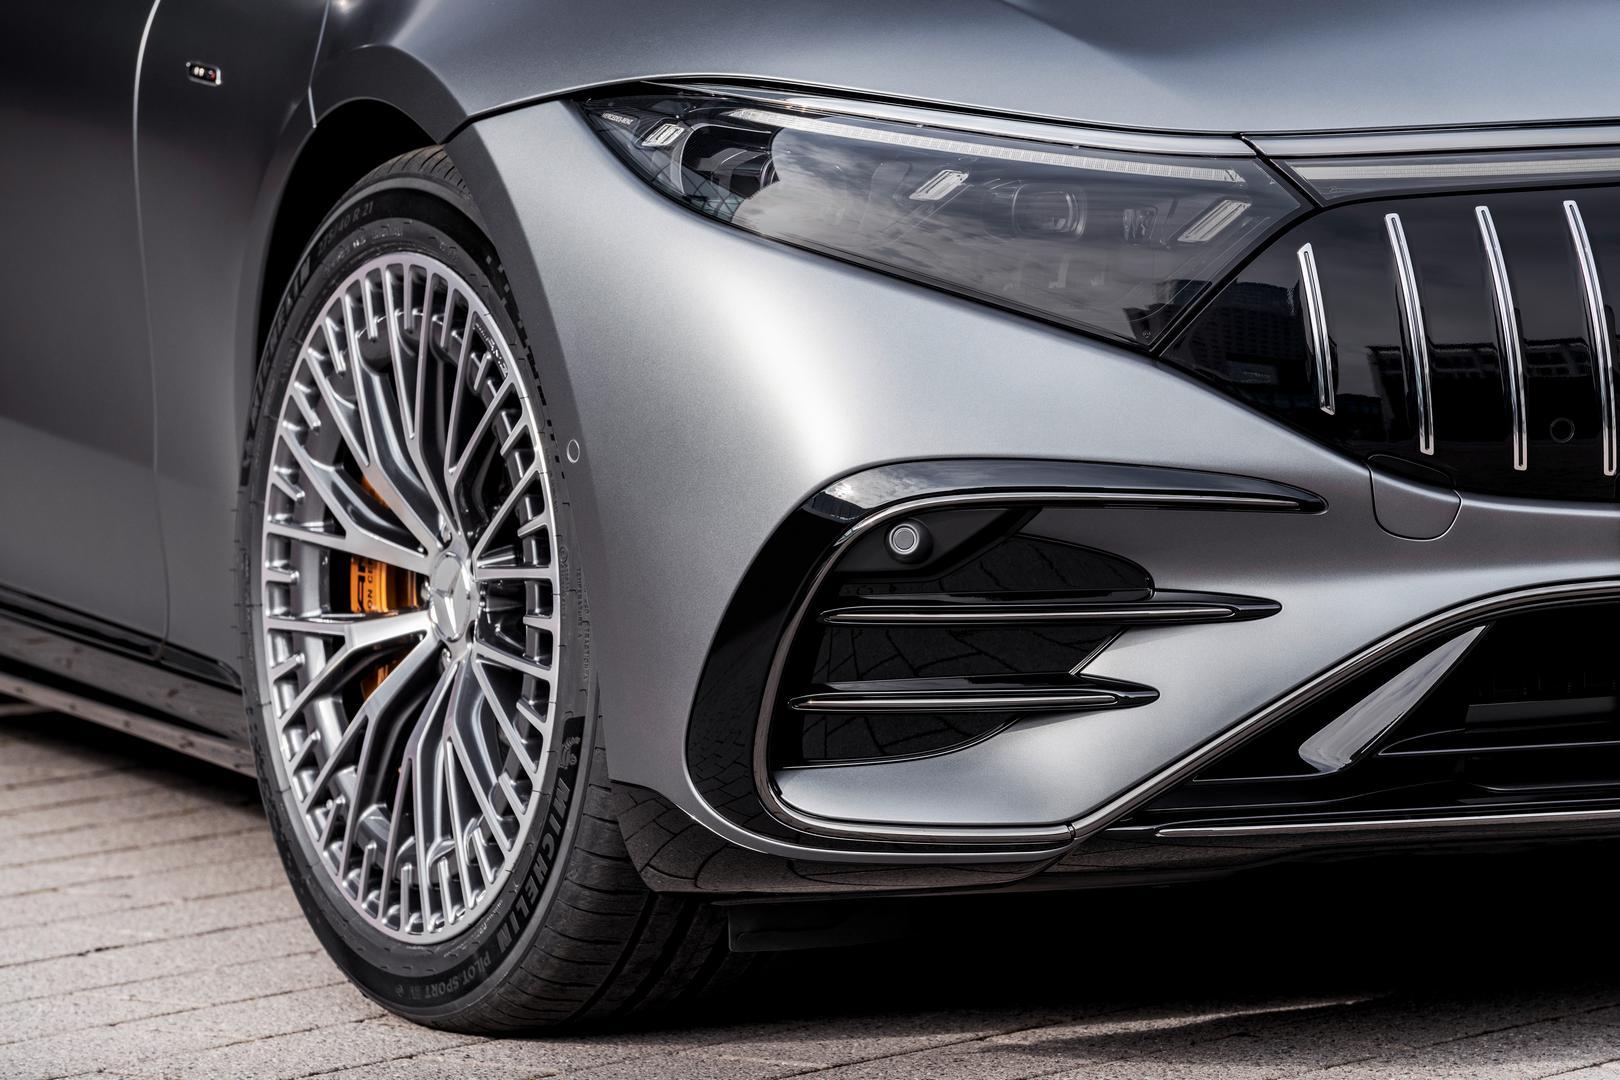 Mercedes-AMG EQS 53 4MATIC+, 2021Mercedes-AMG EQS 53 wheels